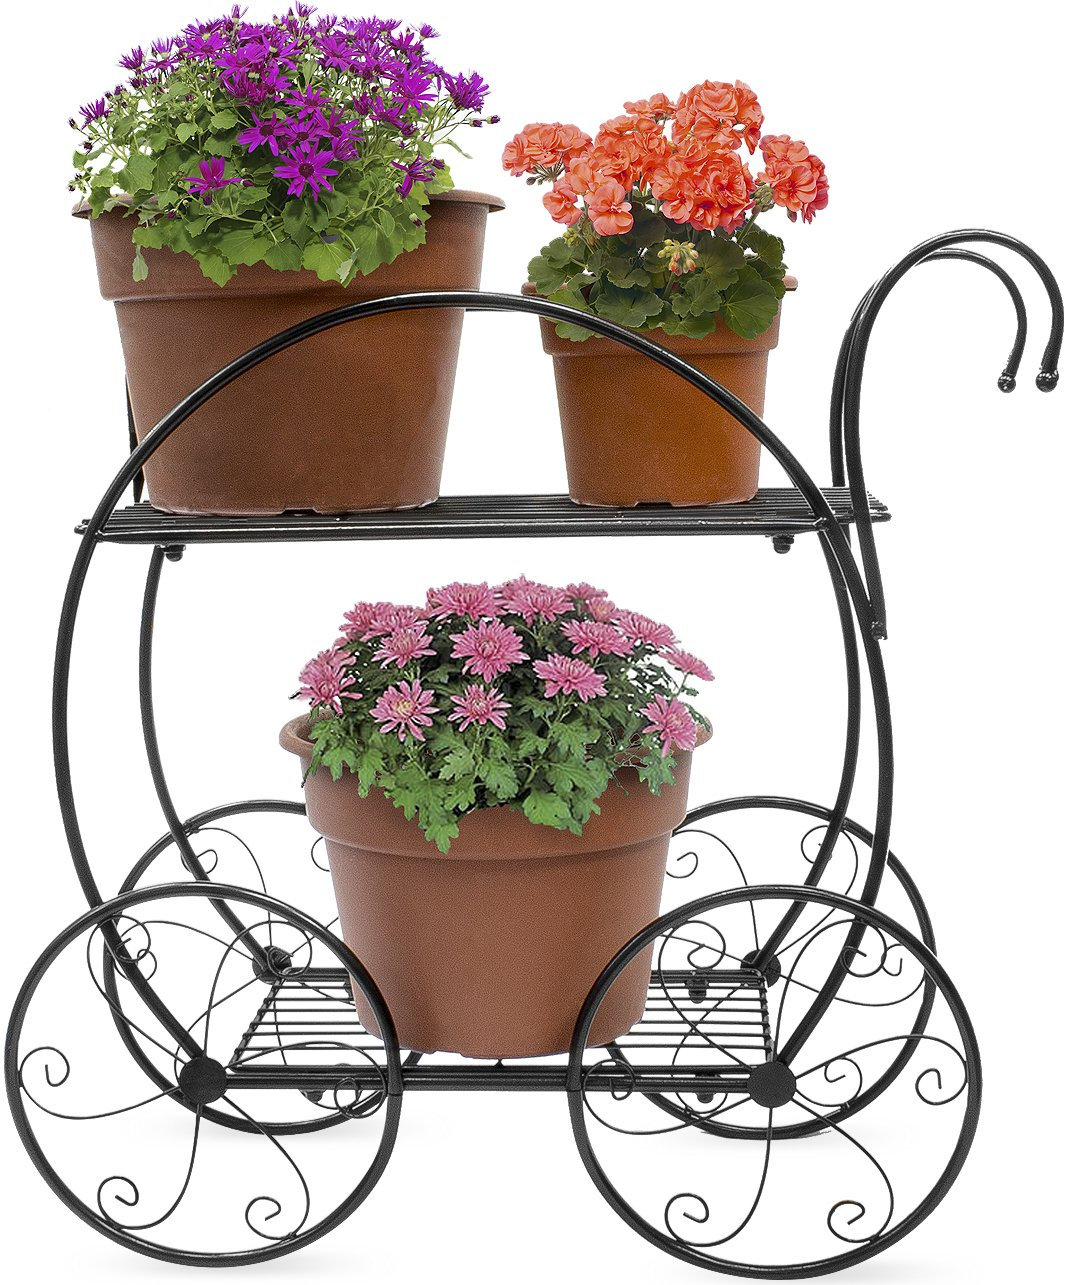 Sorbus Garden Cart Stand & Flower Pot Plant Holder Display Rack, 2 Tier Circular Frame, Parisian Style - Perfect for Home, Garden, Patio (Black)